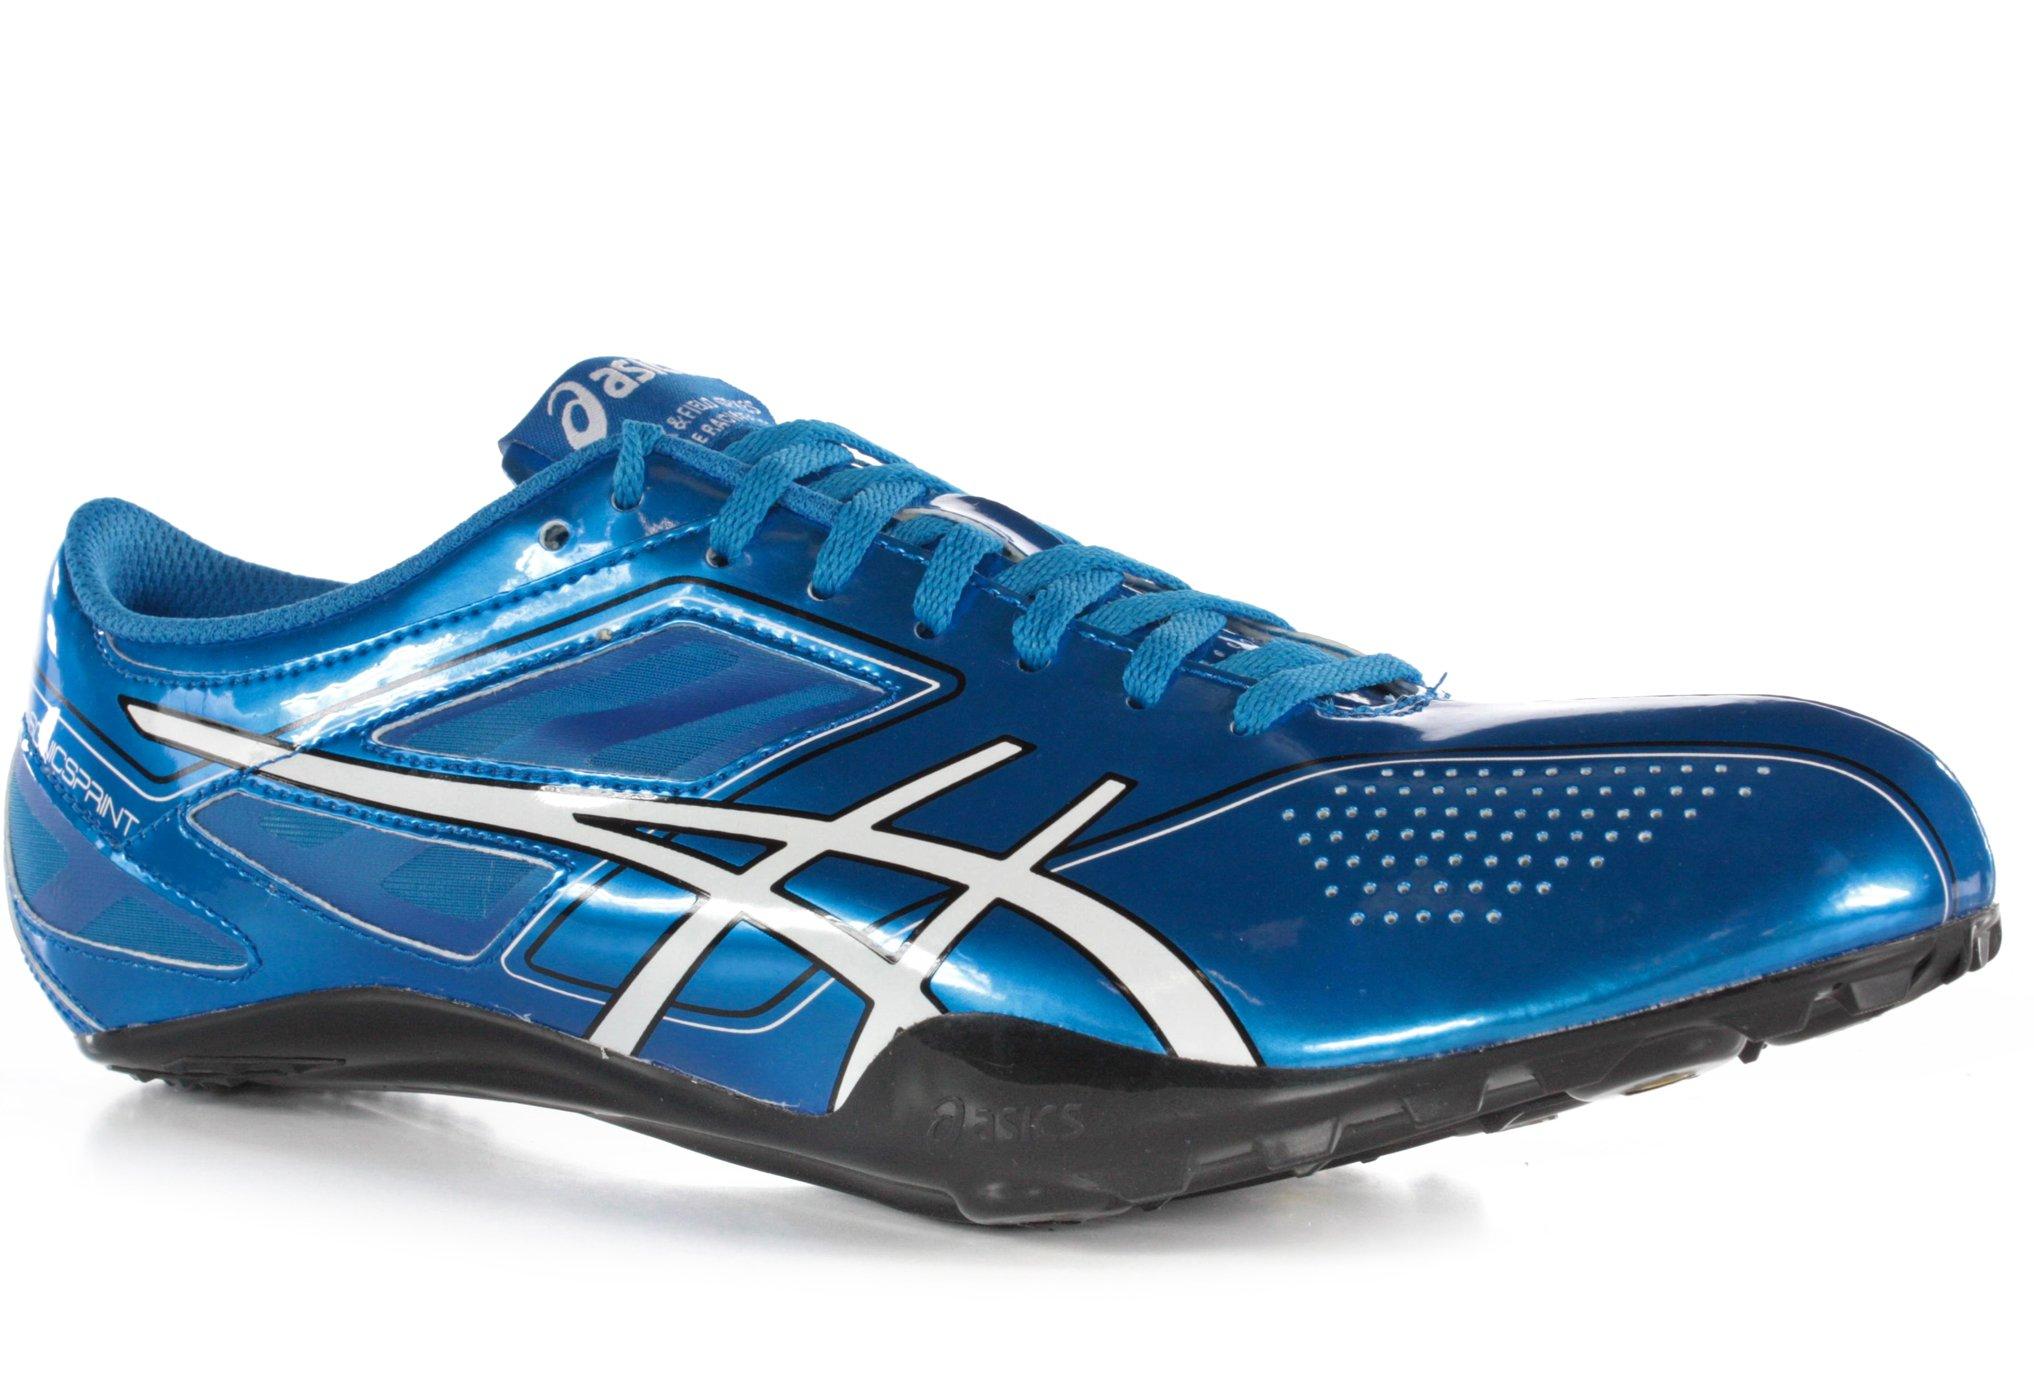 Asics SonicSprint M Chaussures homme